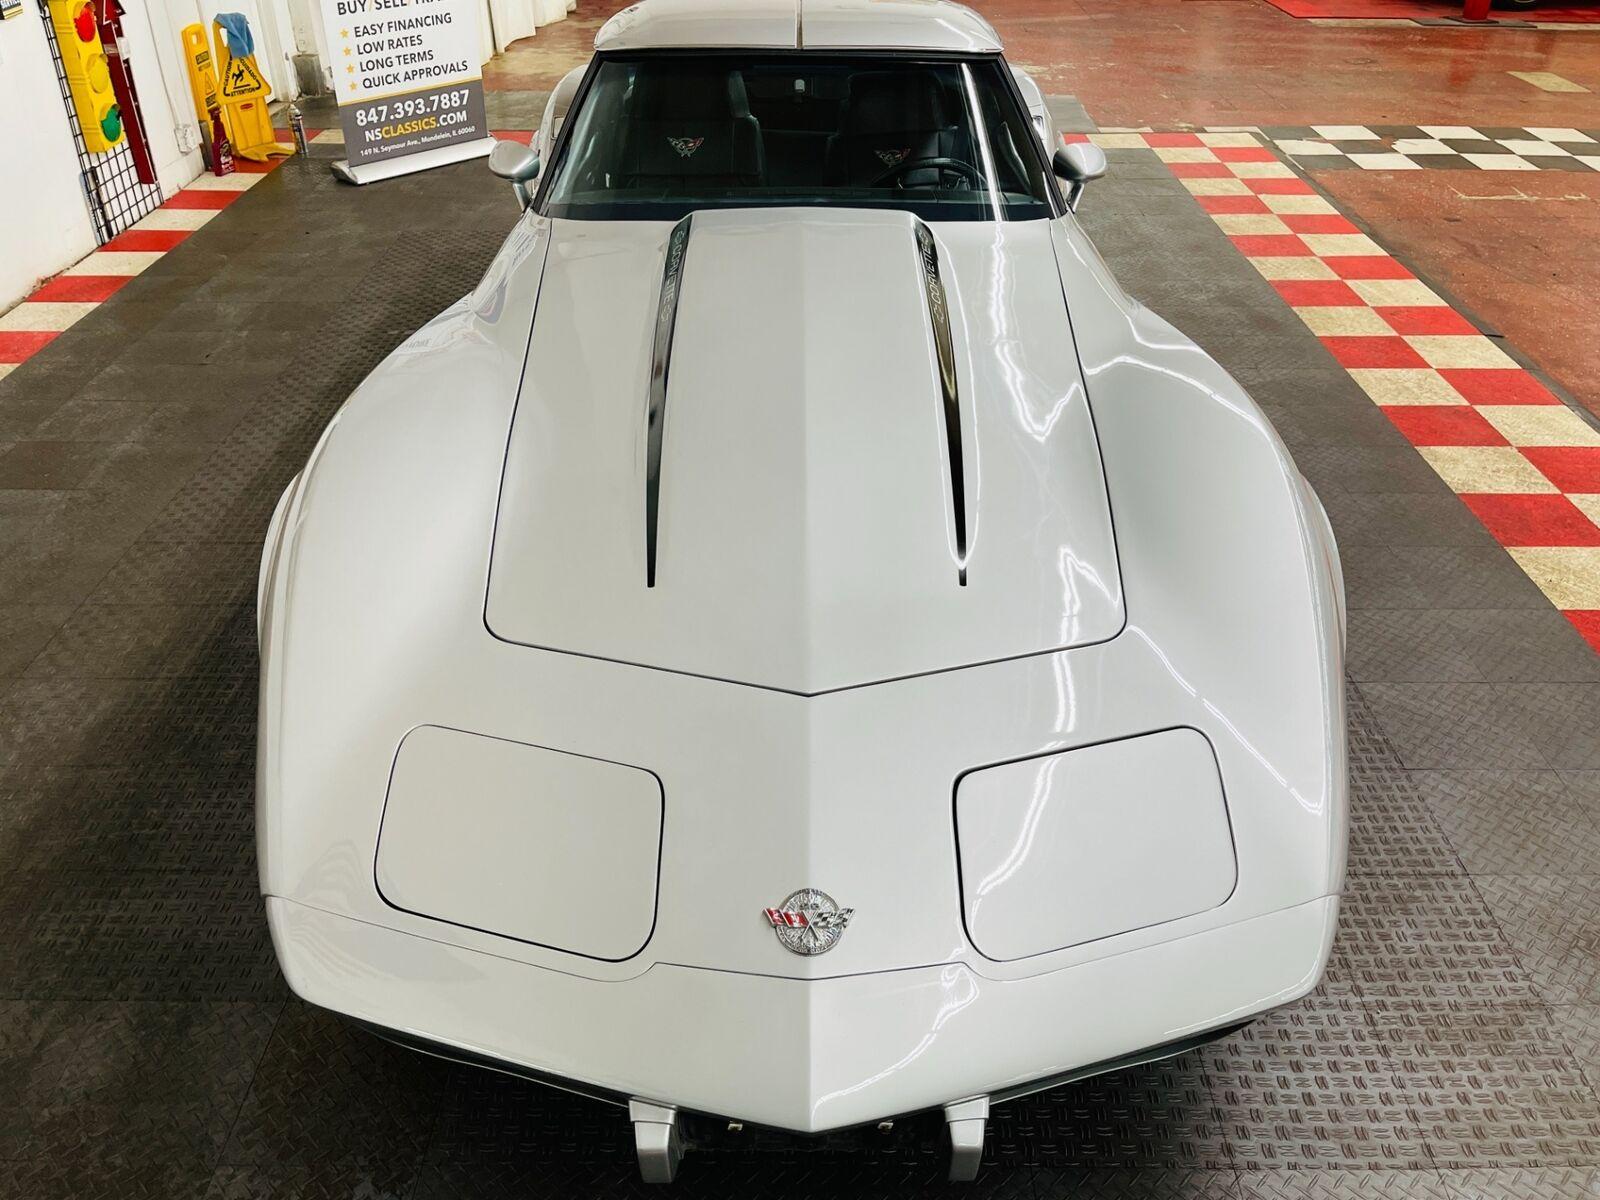 1978 Silver Chevrolet Corvette   | C3 Corvette Photo 8